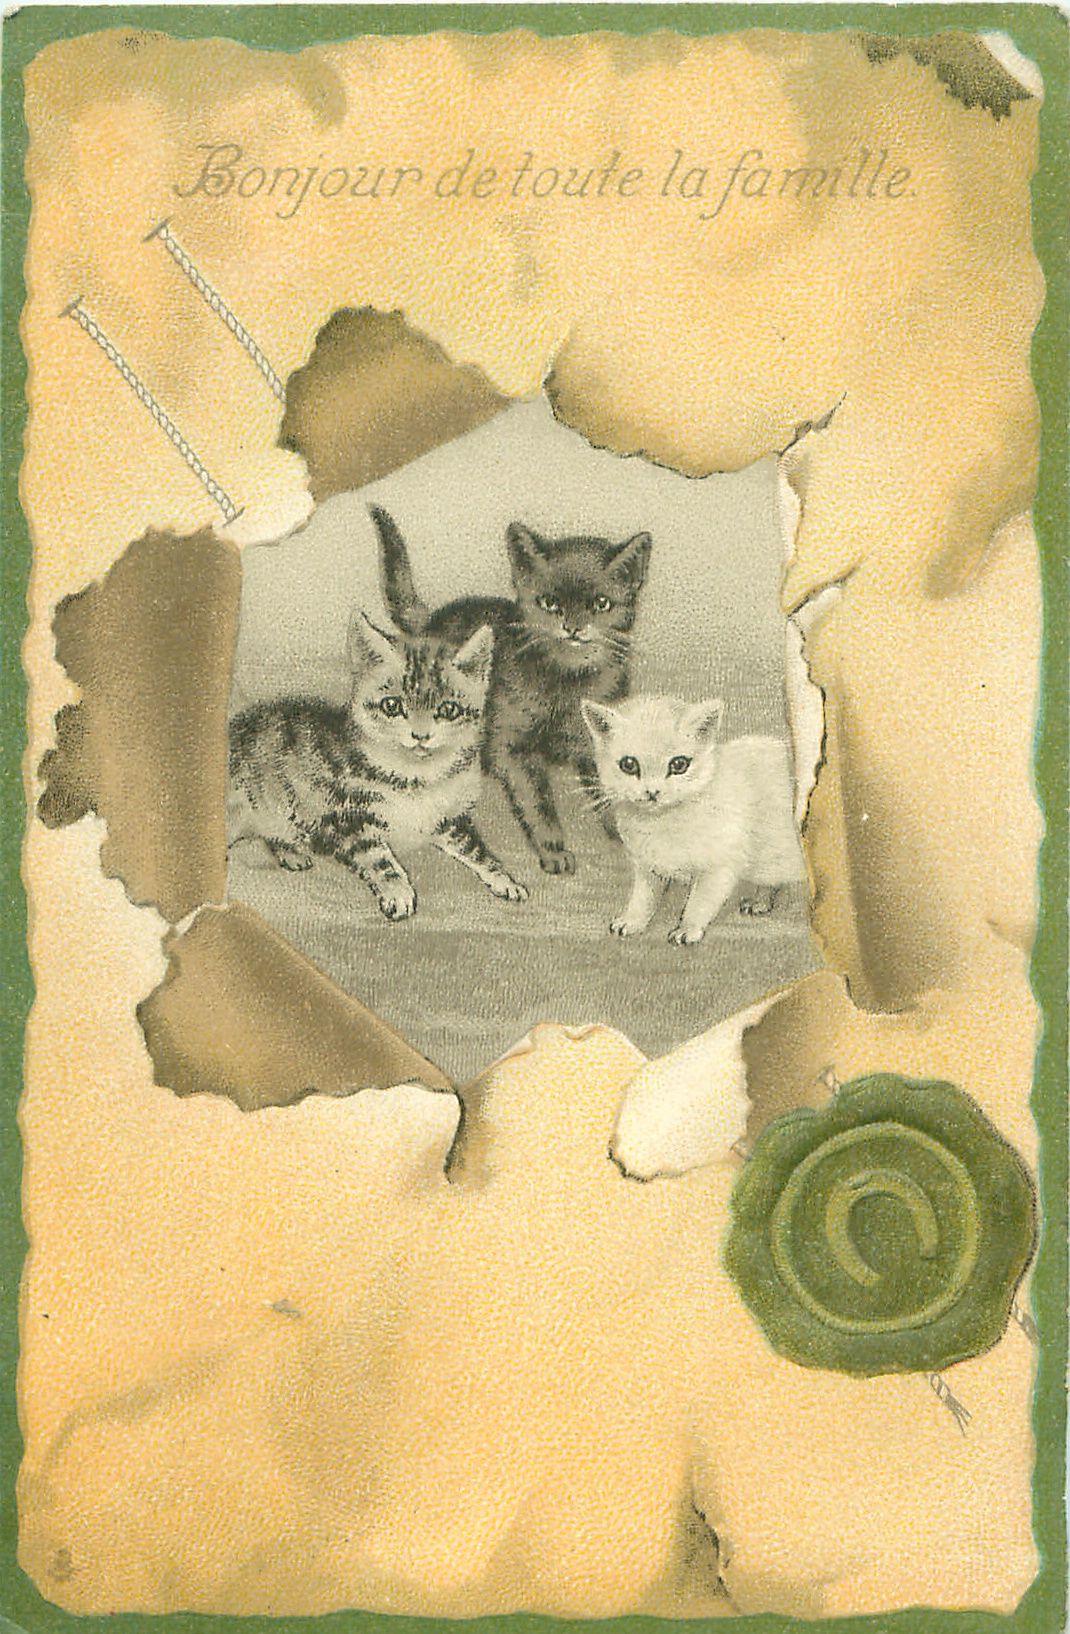 Full Sized Image: BONJOUR DE TOUTE LA FAMILLE inset of three kittens facing front - TuckDB